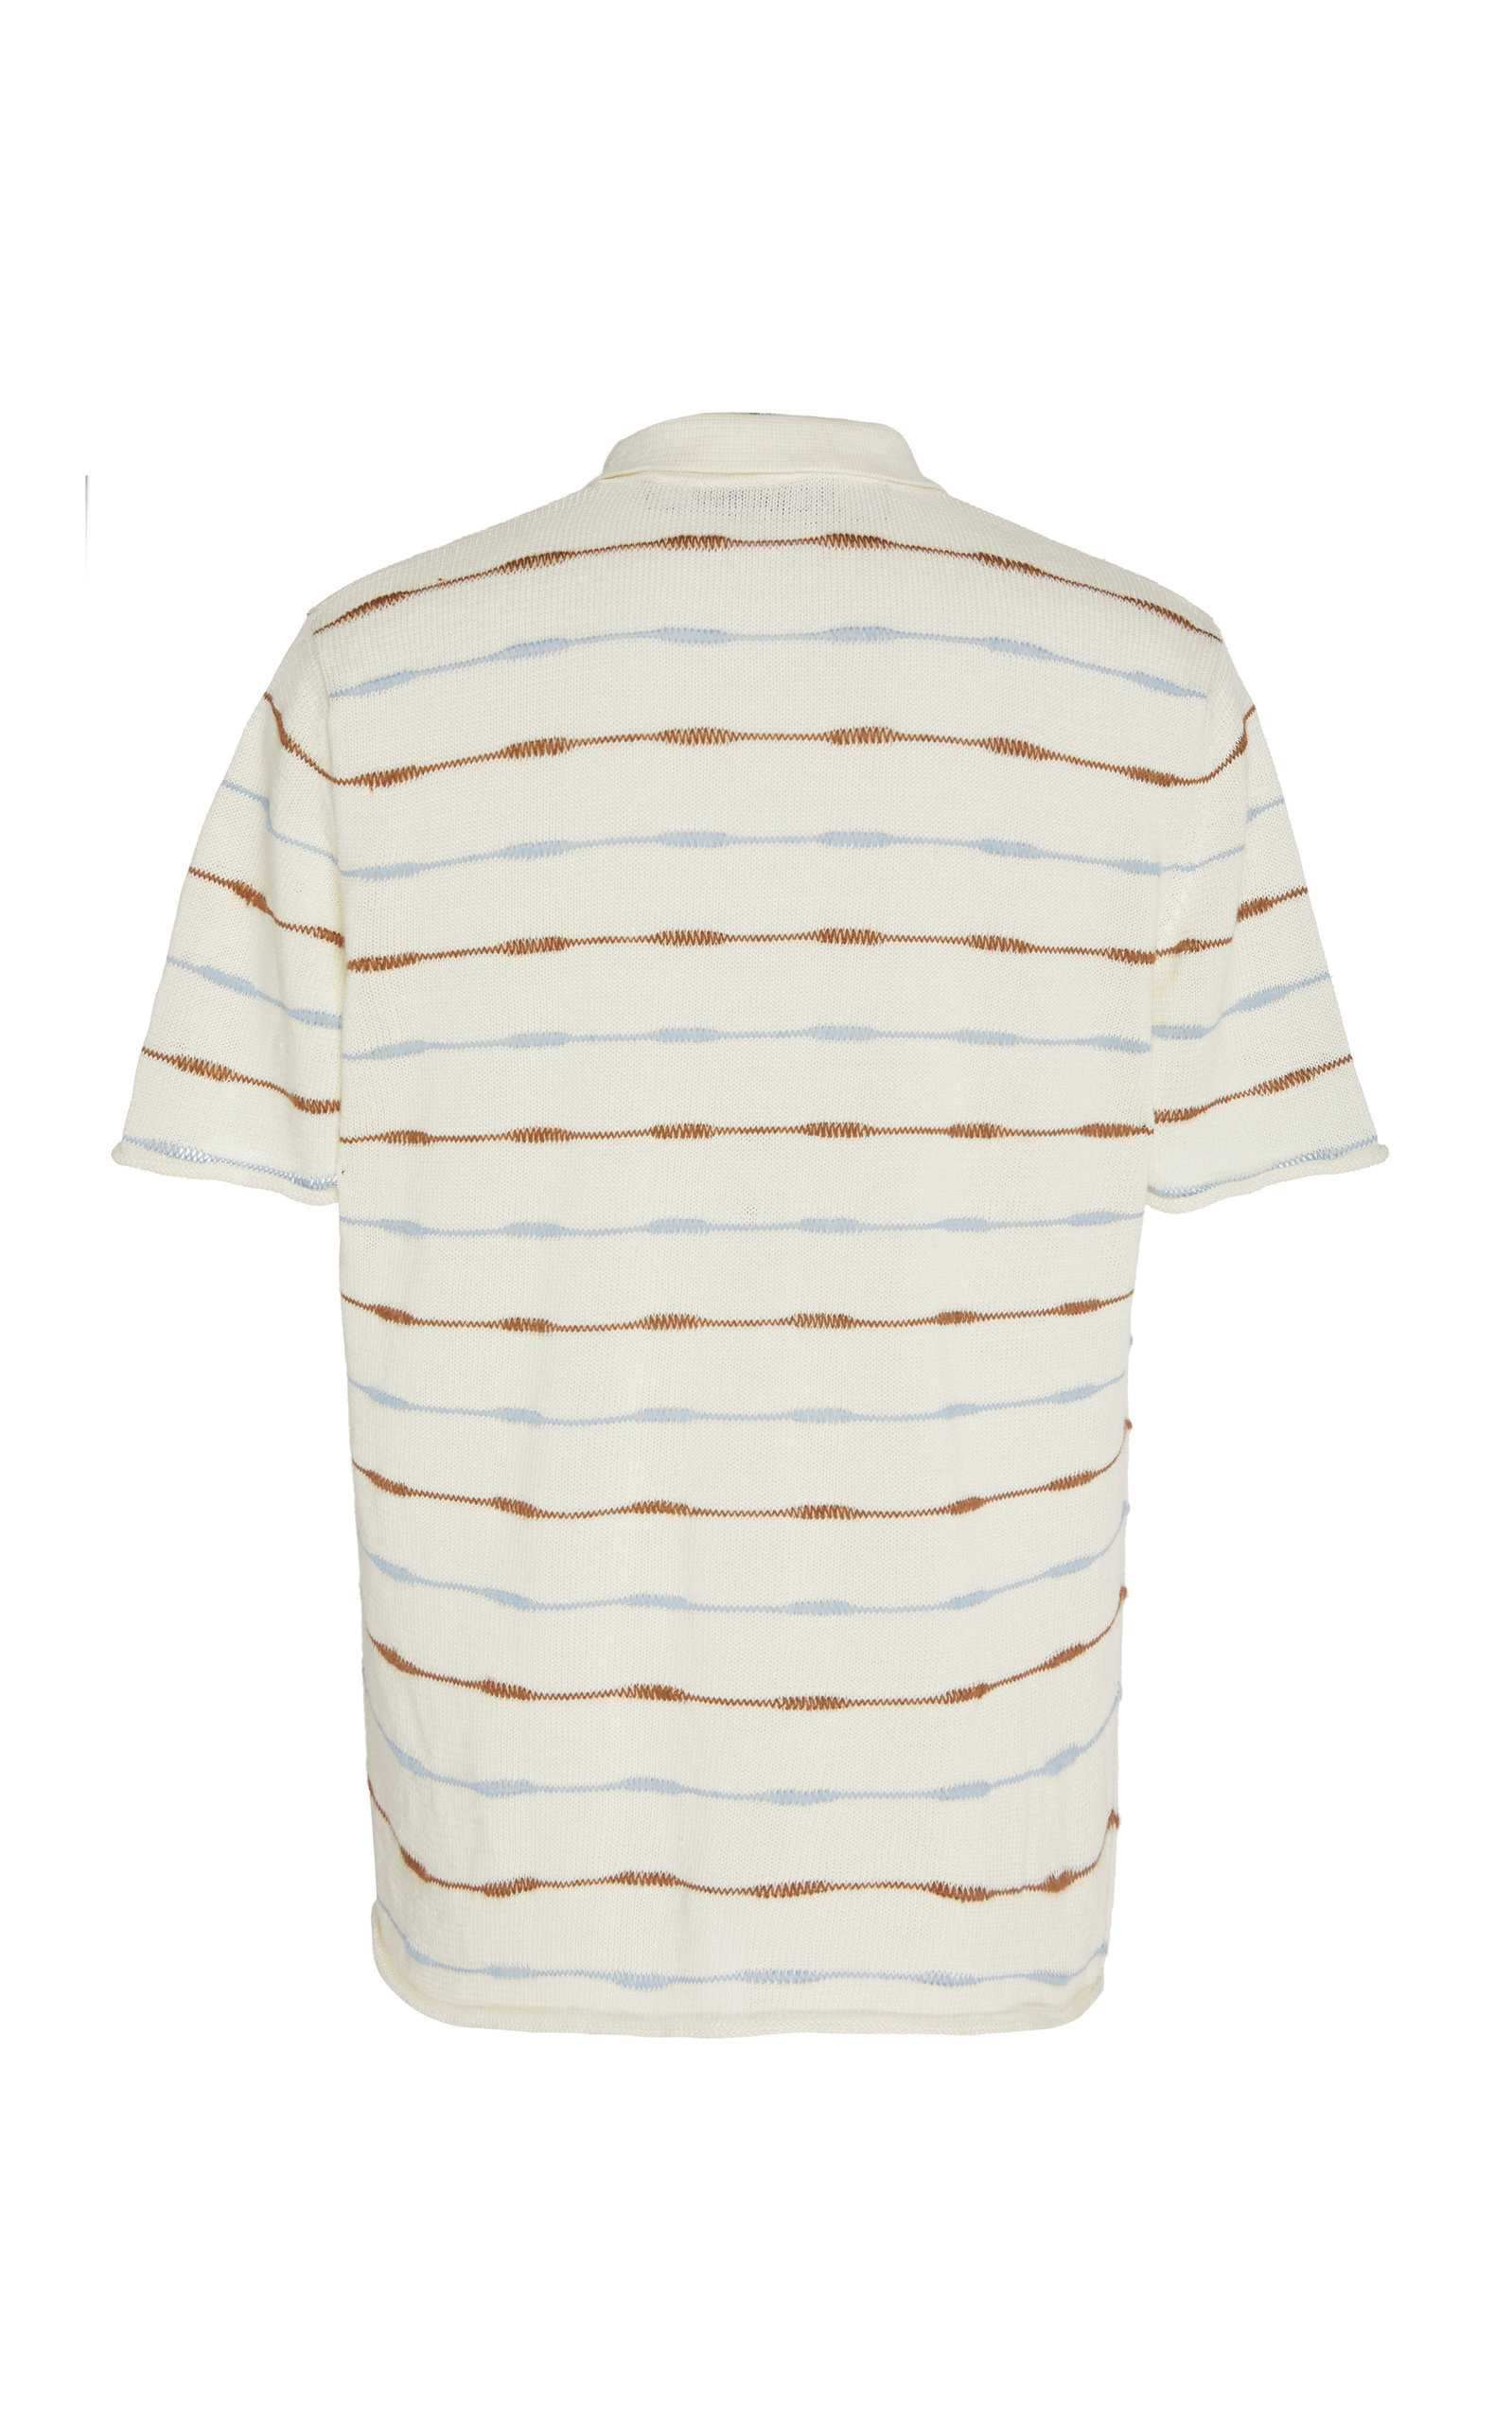 La Chemise Maille Striped Linen Polo Shirt By Moda Operandi